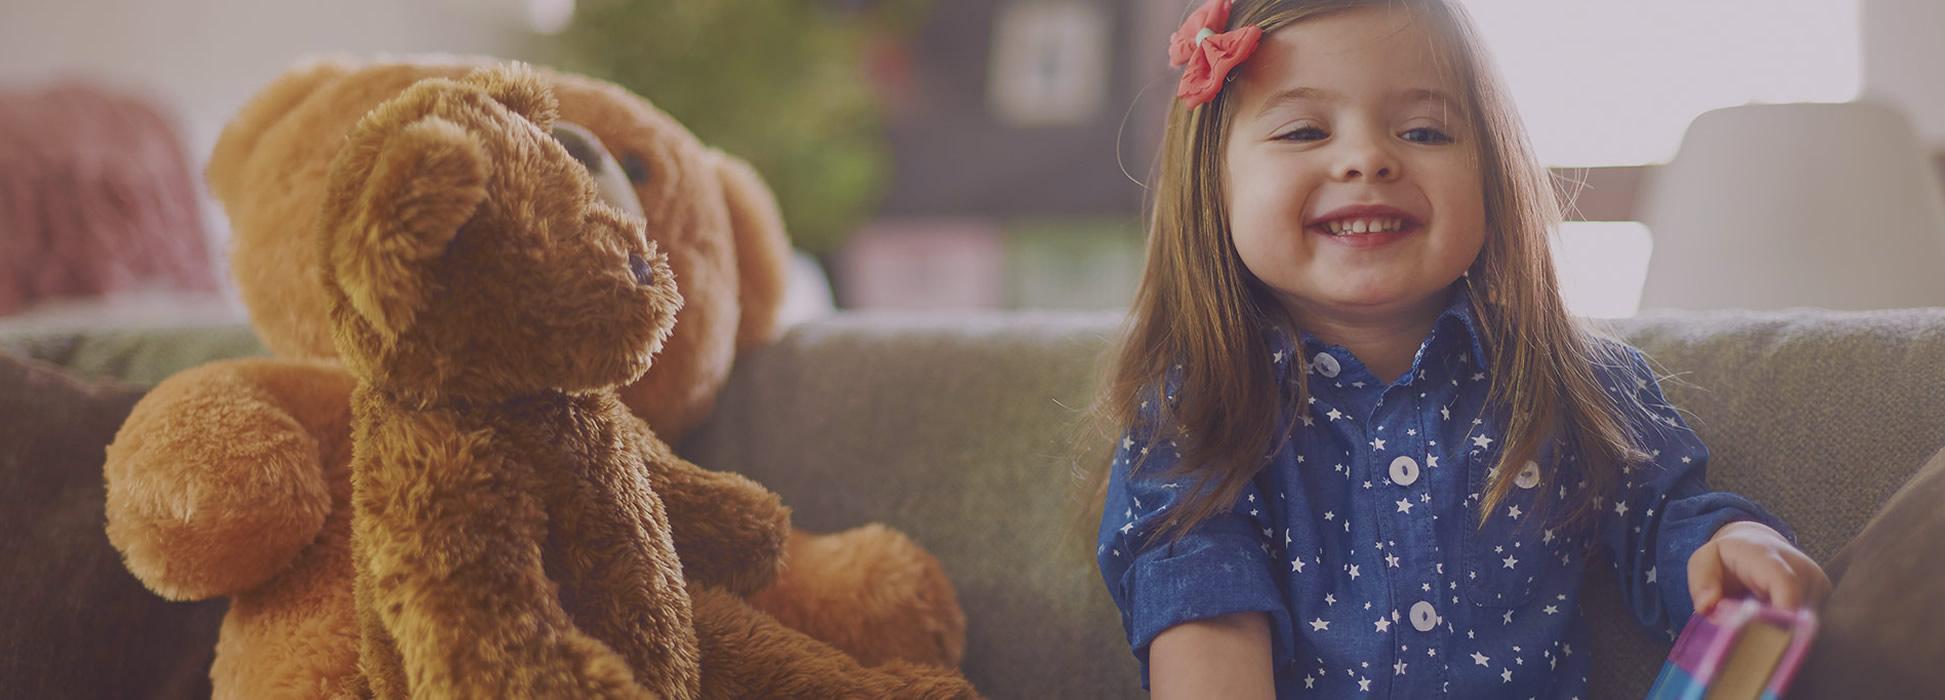 childrens-charity-foundation-sydney